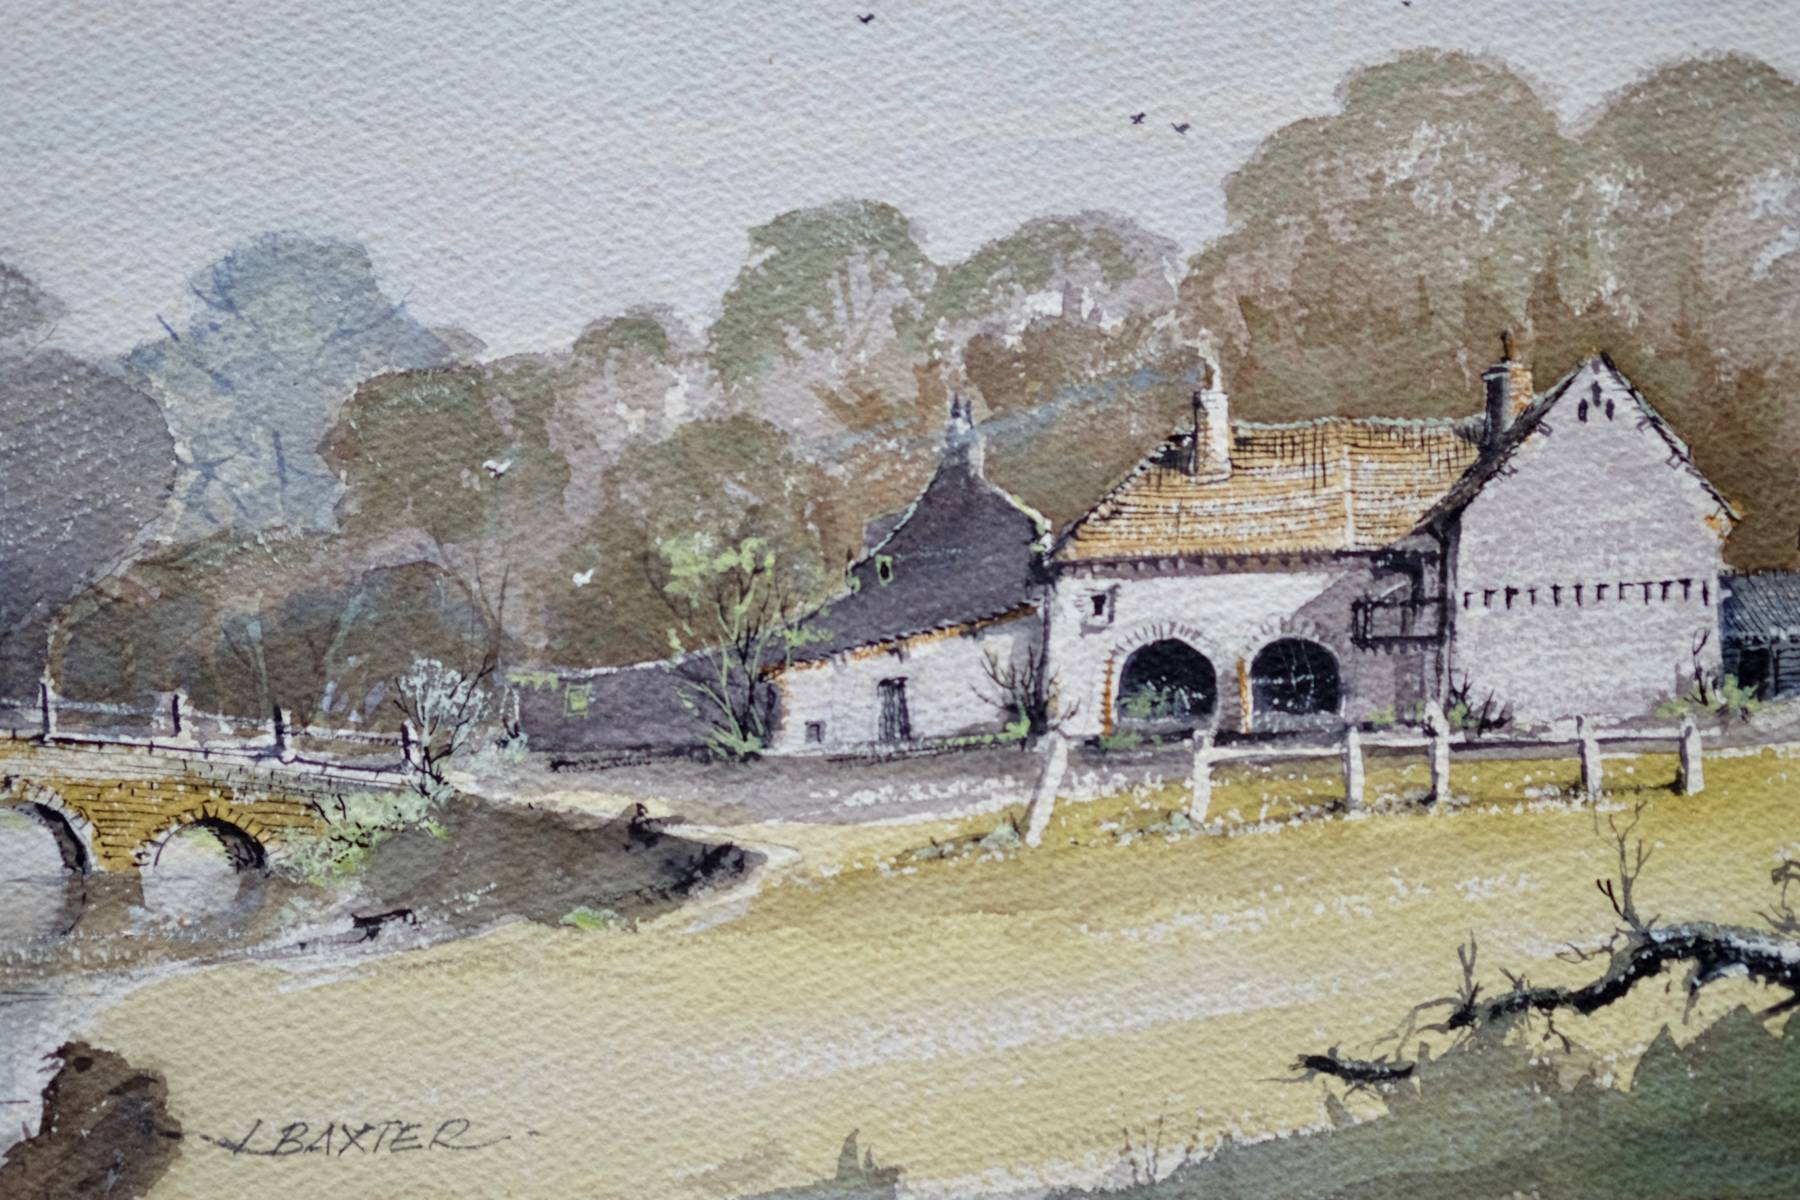 Farmhouse and Bridge